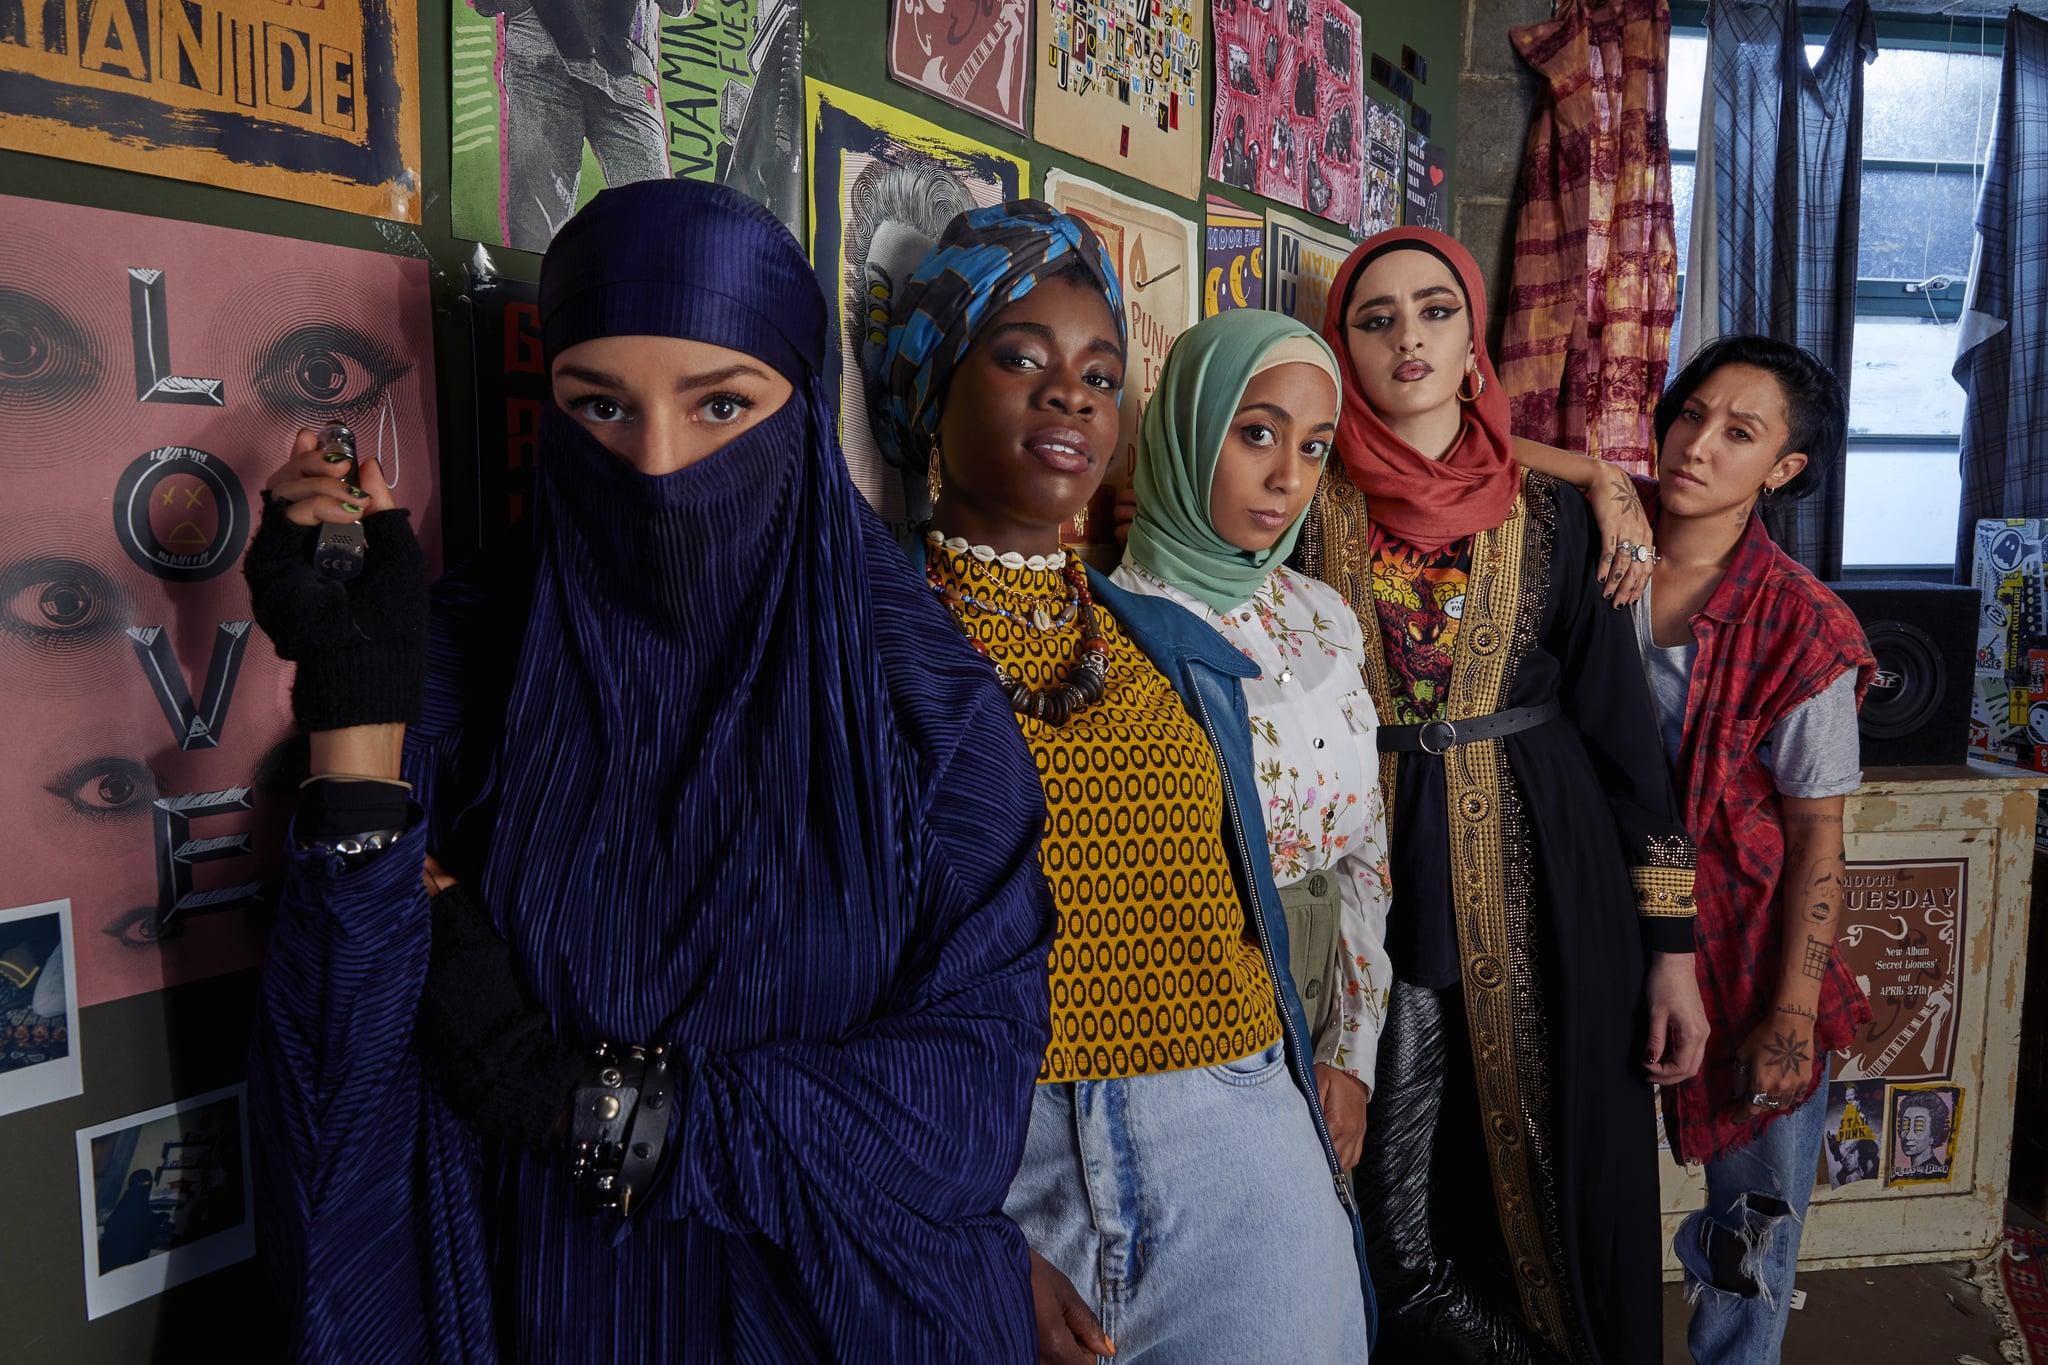 LR - Lucie Shorthouse (Momtaz) ، Faith Omole (Bisma) ، Anjana Vasan (Amina) ، Juliette Motamed (Ayesha) ، Sarah Impey (Saira)